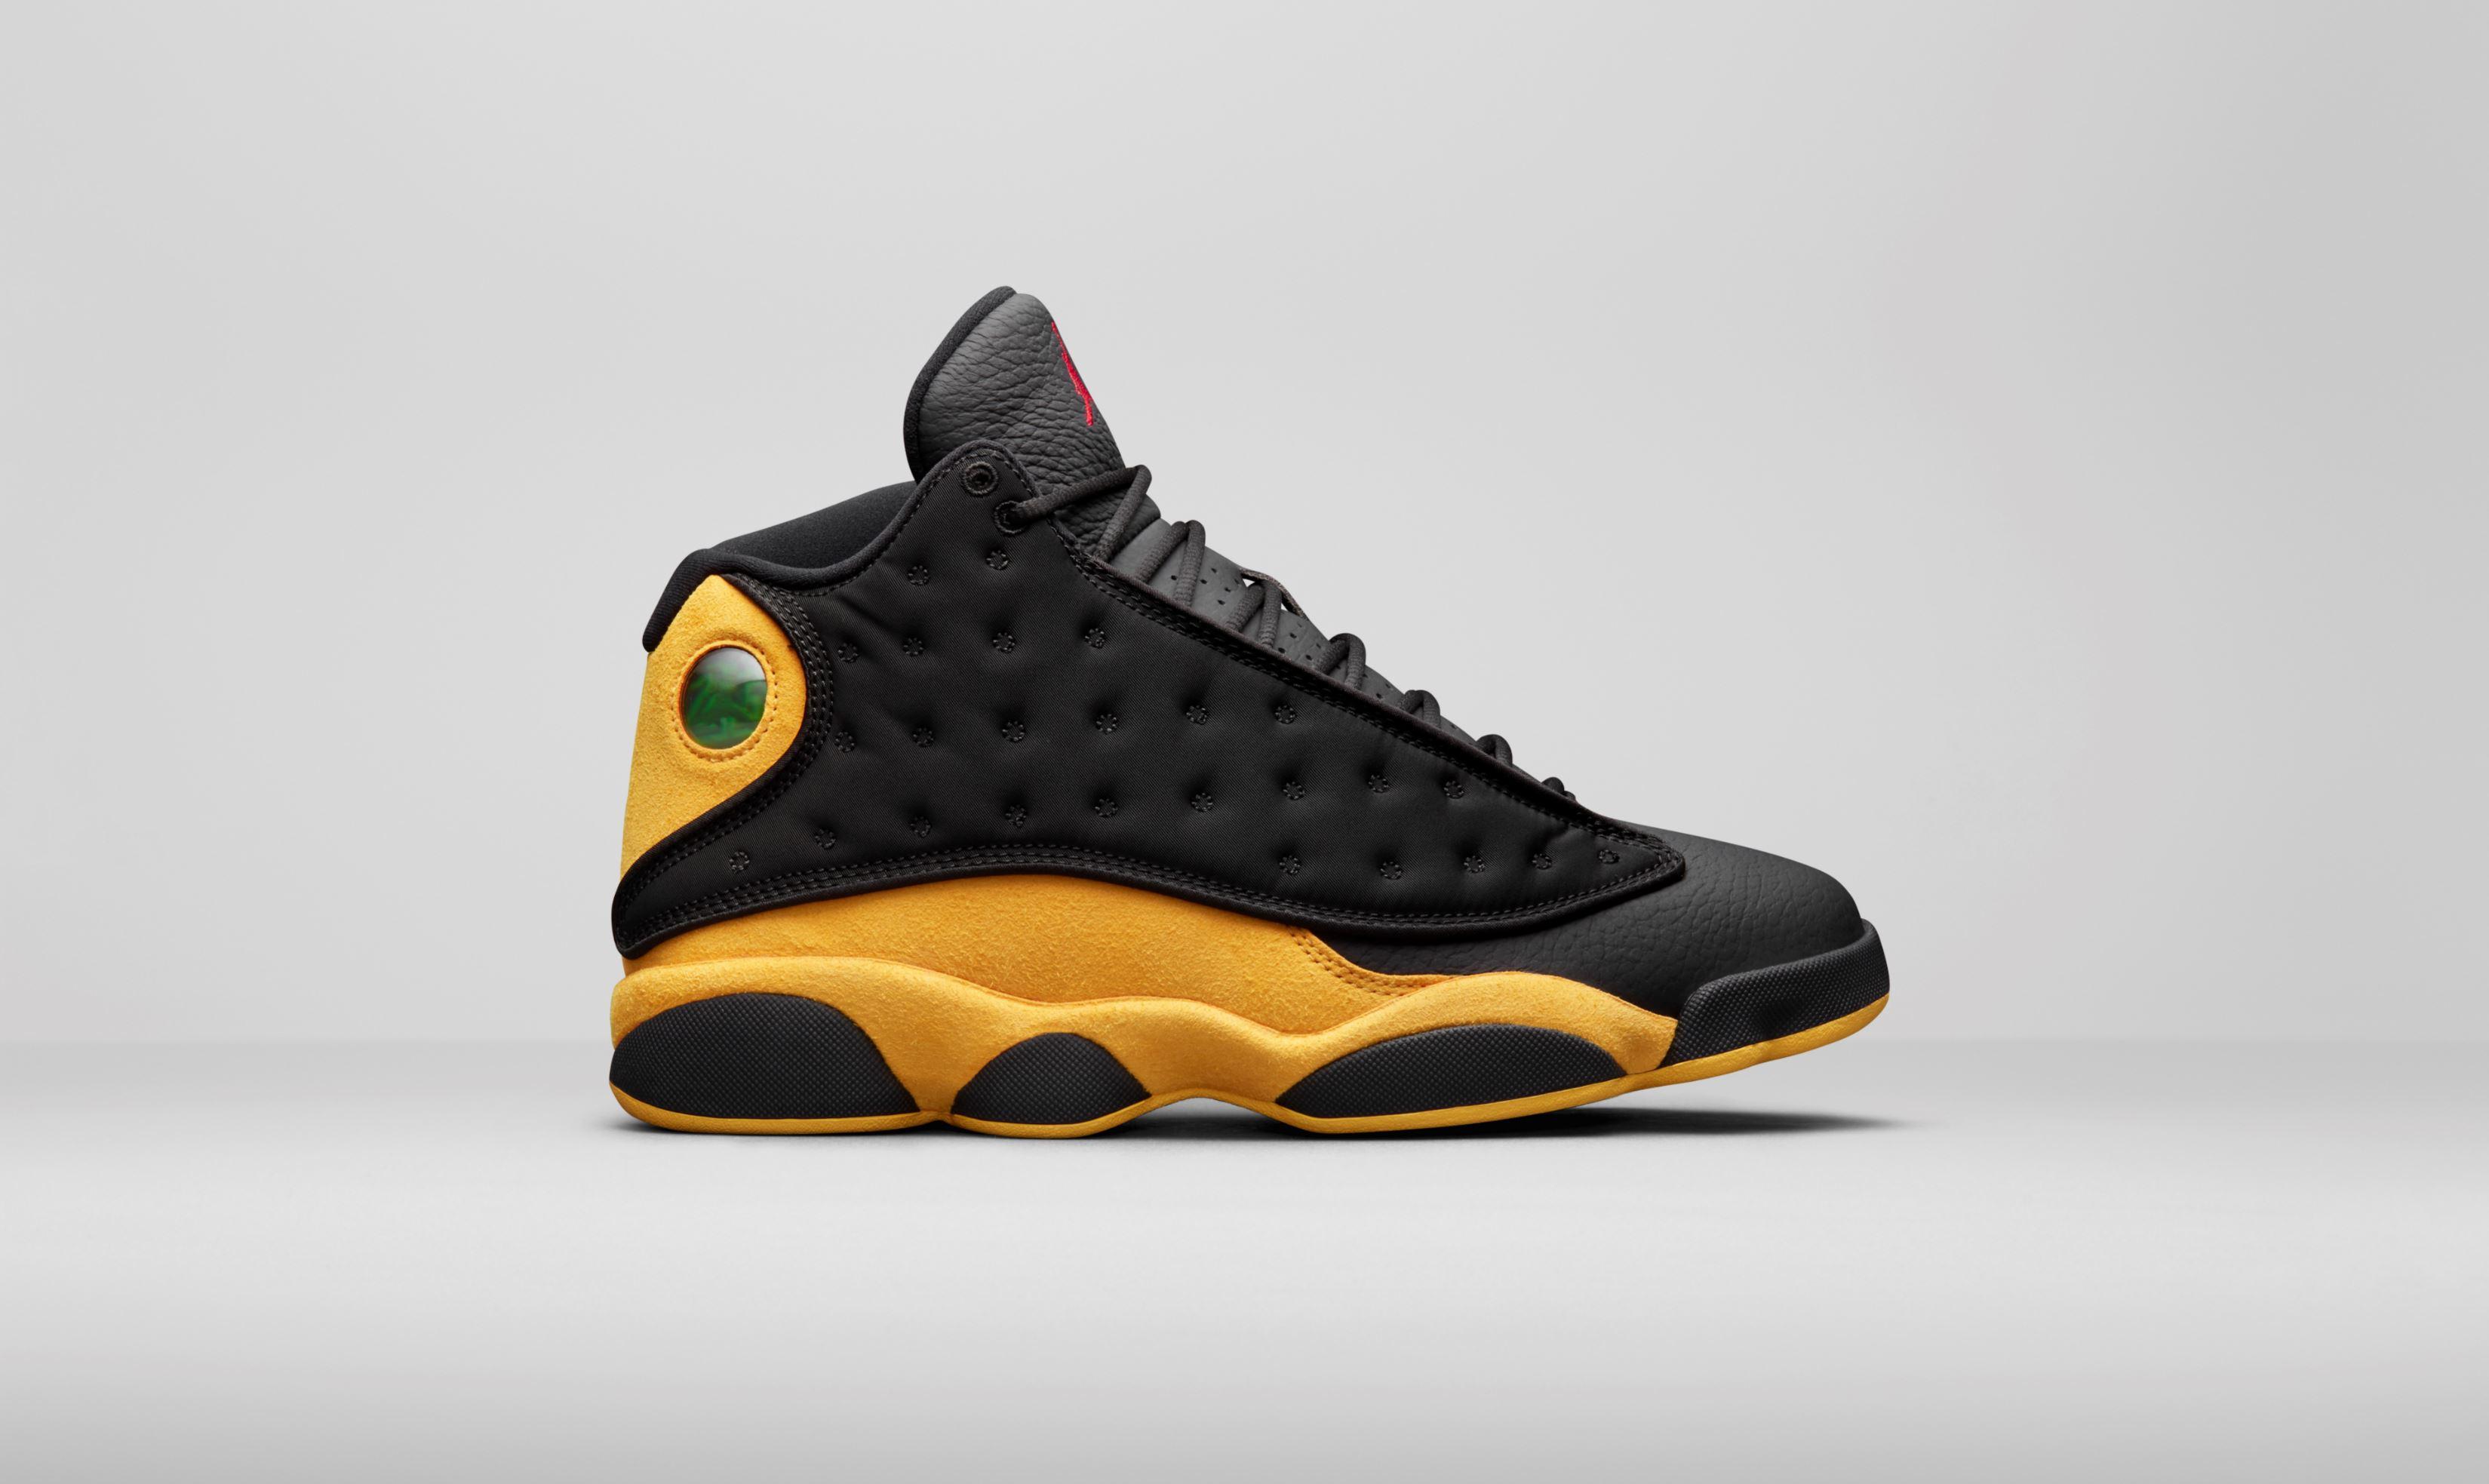 buy online 4a502 6c511 air jordan 13 carmelo anthony · Jordan Brand   Kicks On Court ...